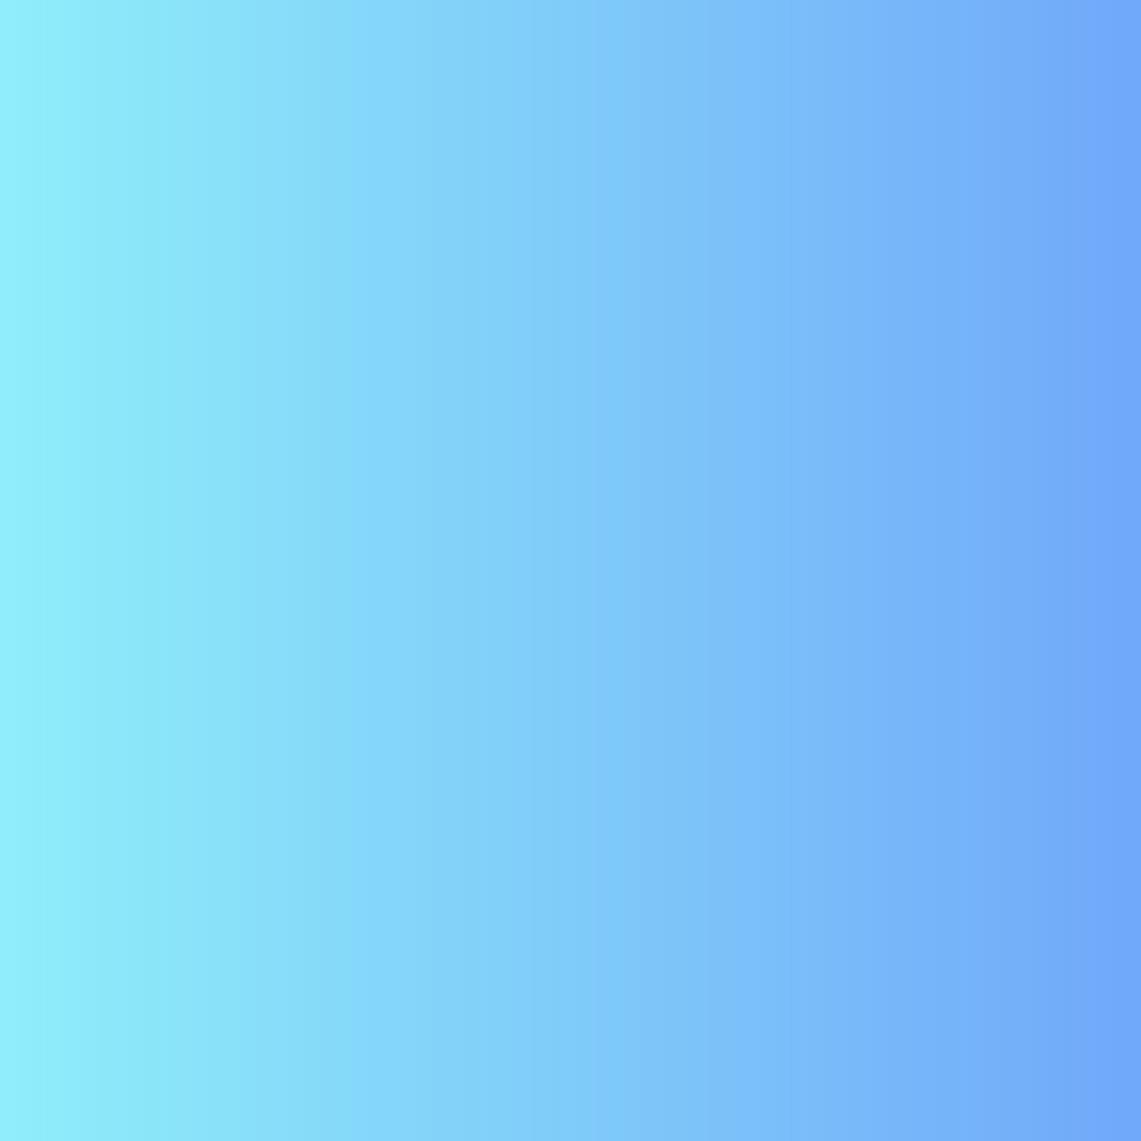 GRADIENT-LIGHT-BLUE-02-SQUERE-03